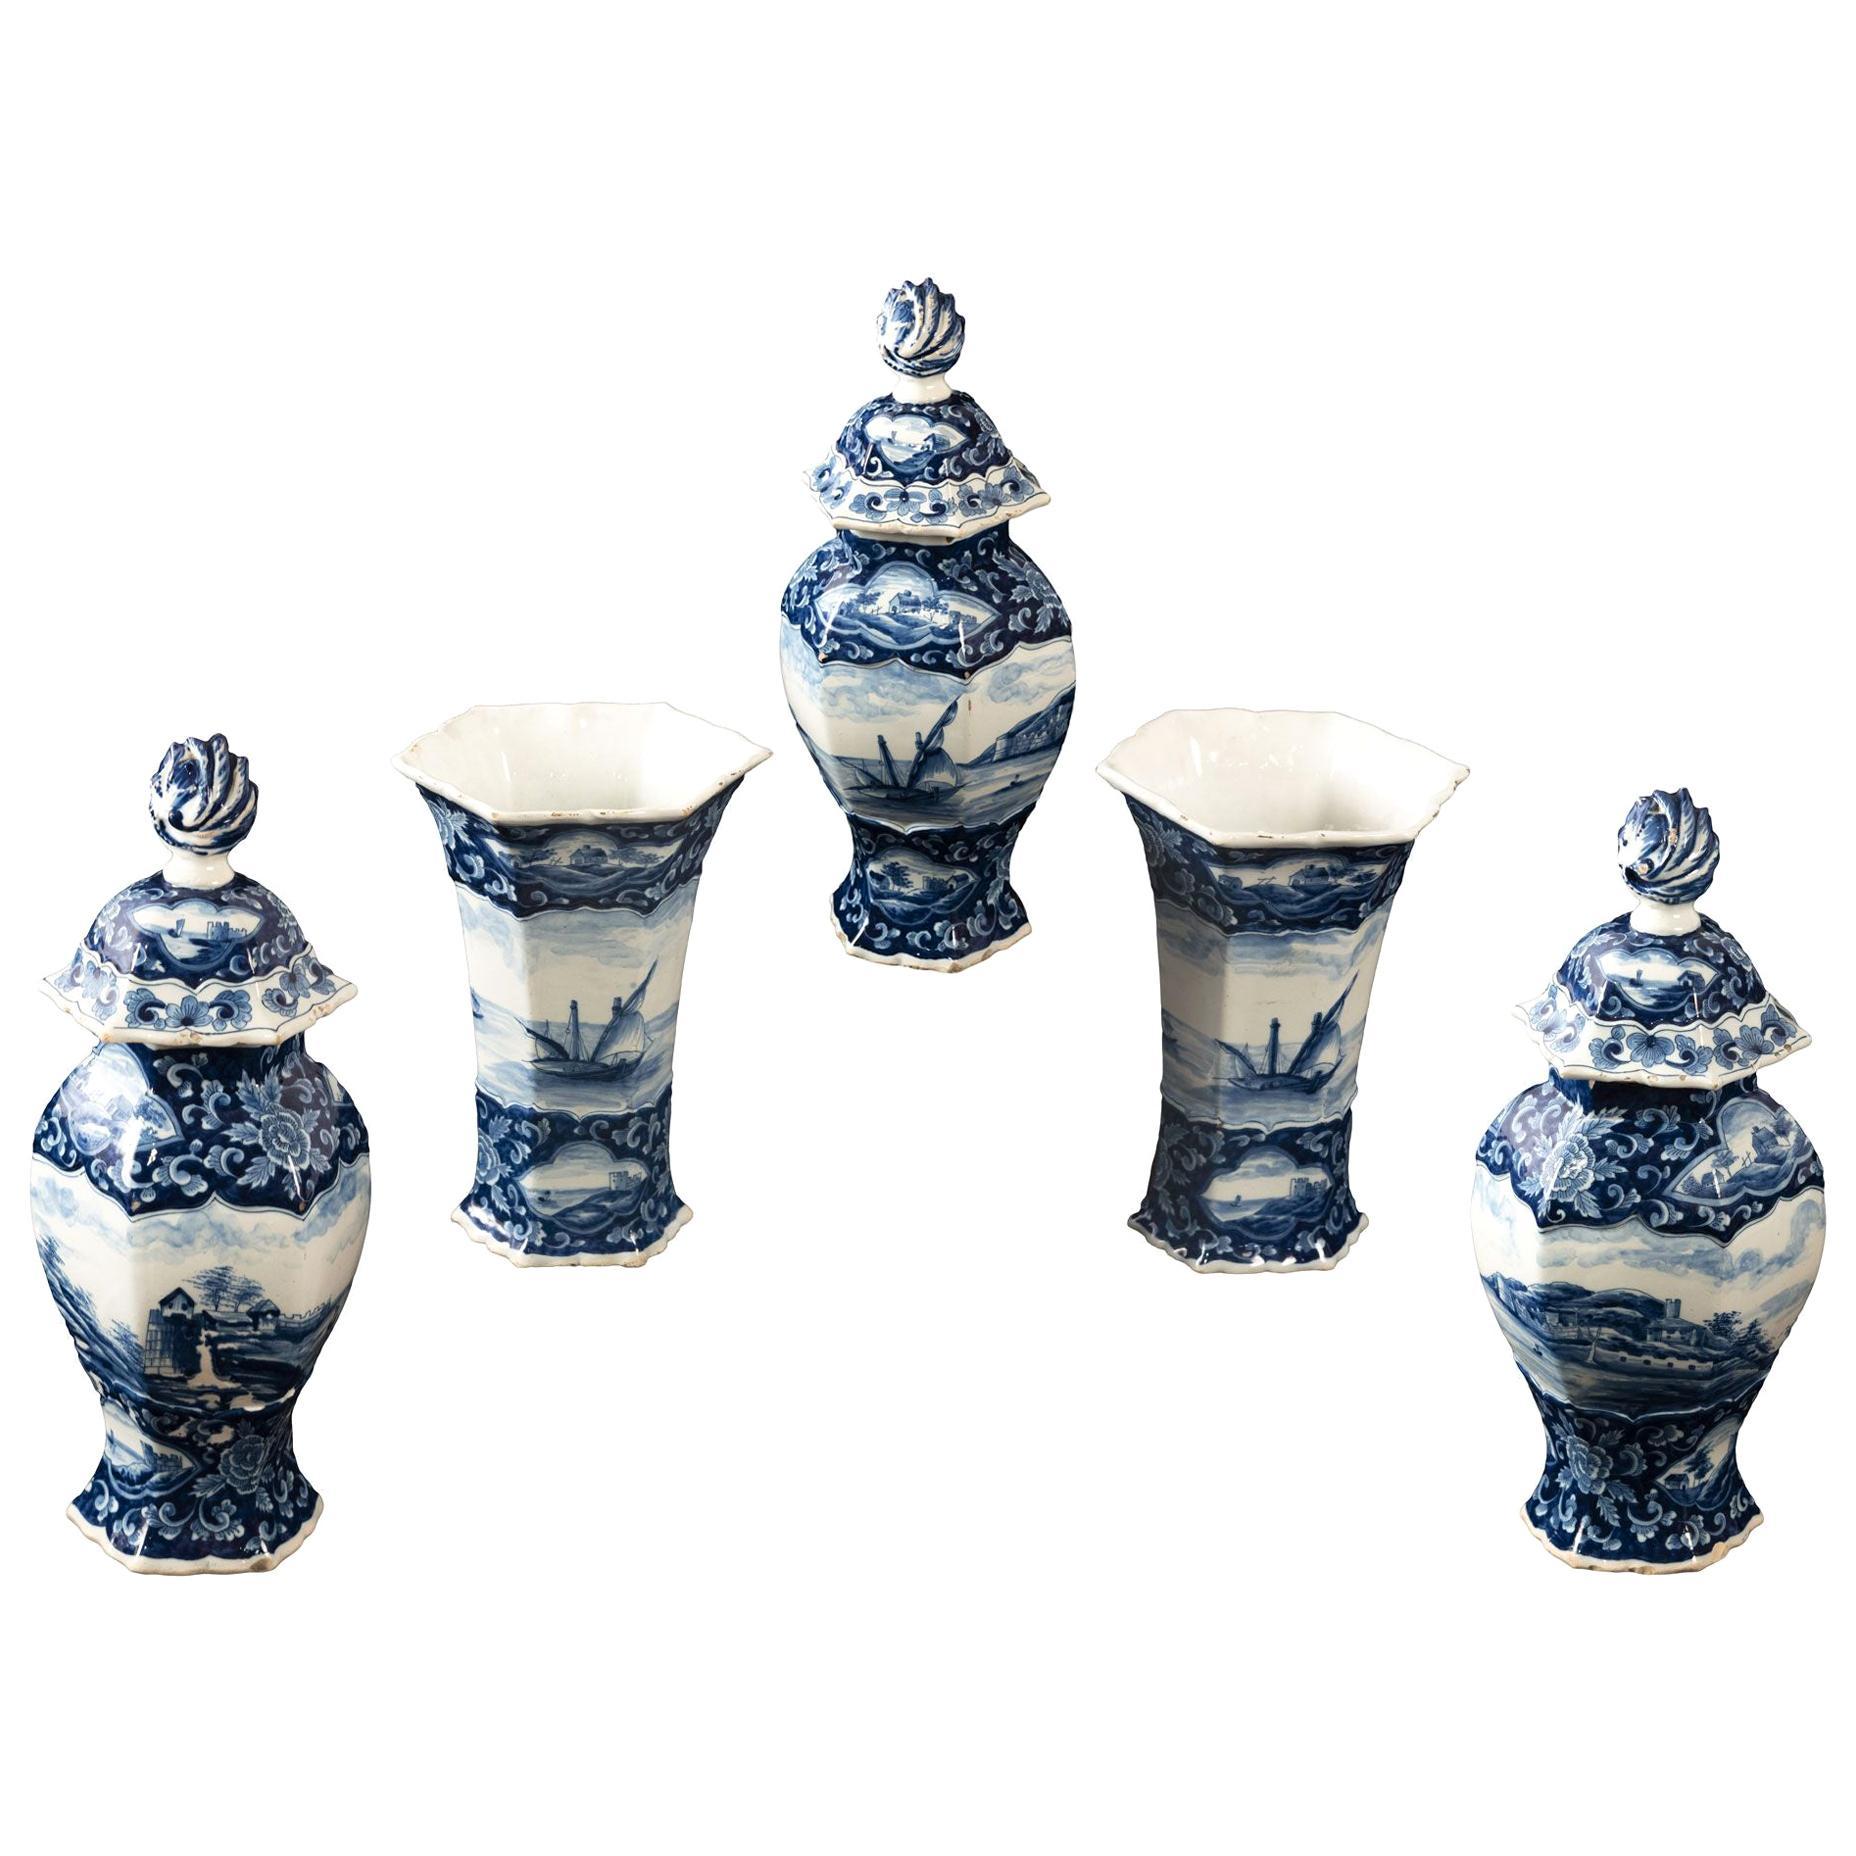 Dutch Tin-Glazed Earthenware Garniture Set